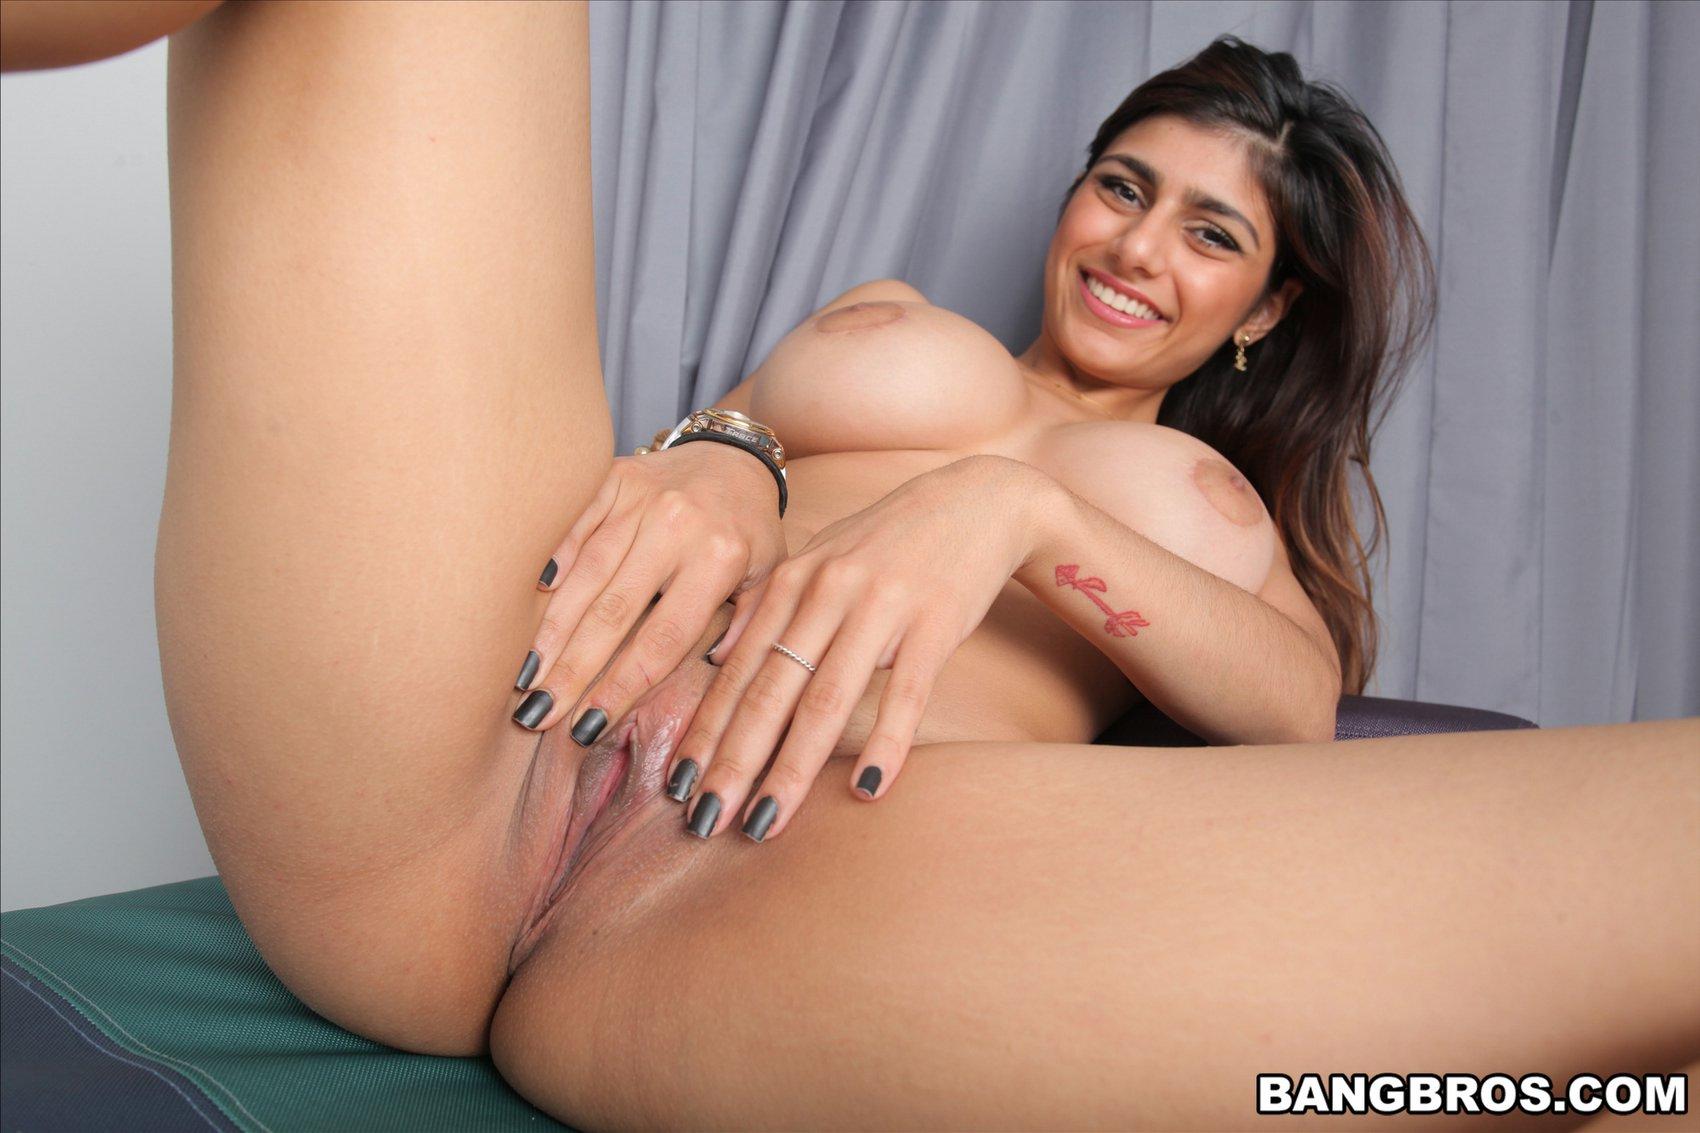 Pornstar Mia Khalifa